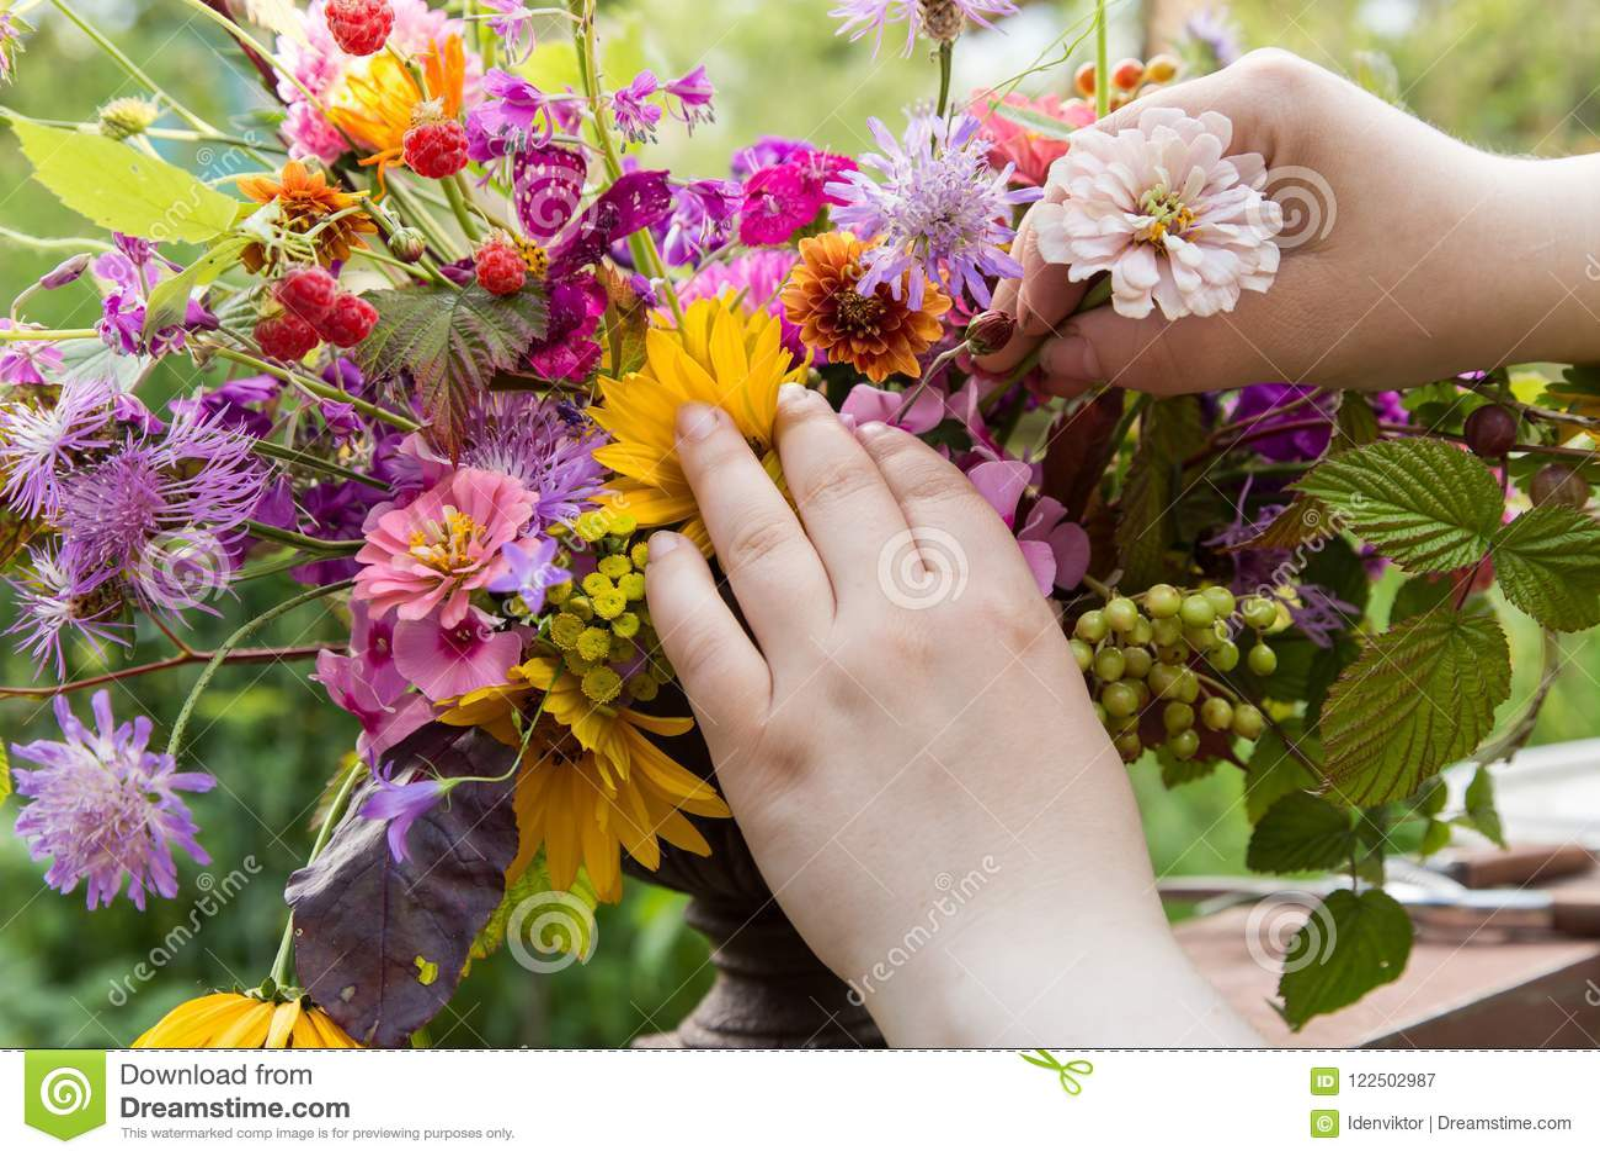 Florist Hands Make A Wedding Bouquet Stock Image Image Of Beauty